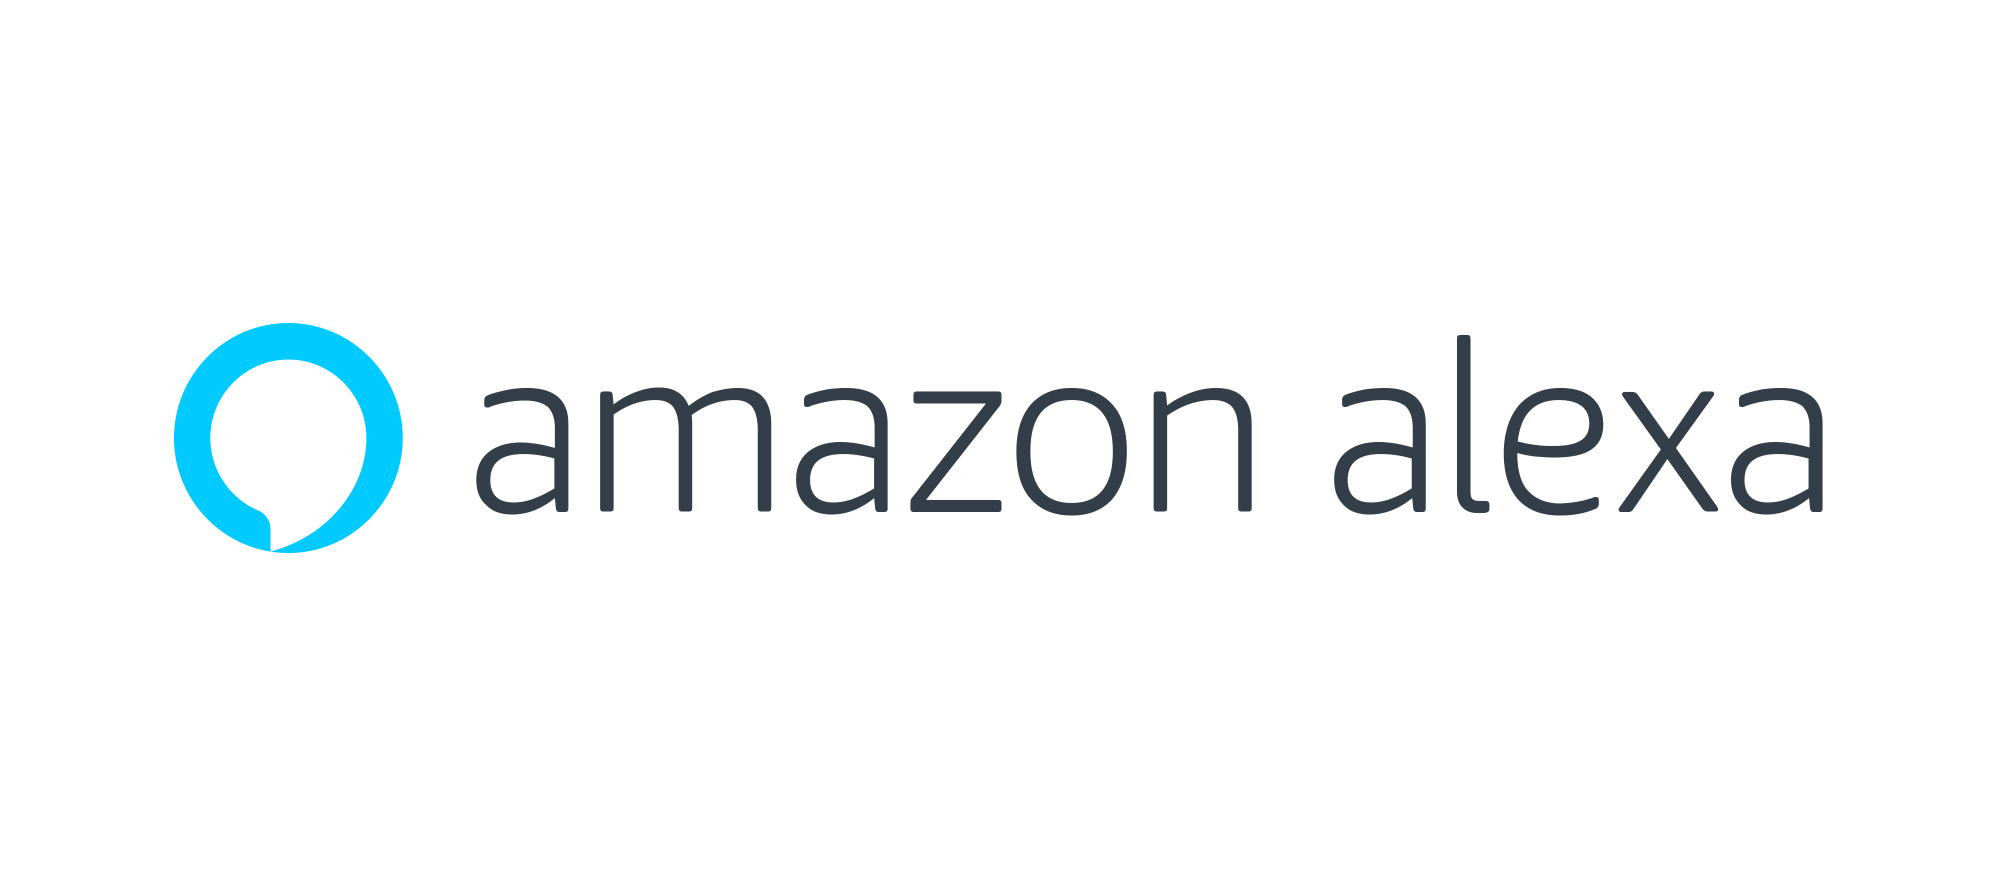 Amazon Alexa - The latest in voice control technology